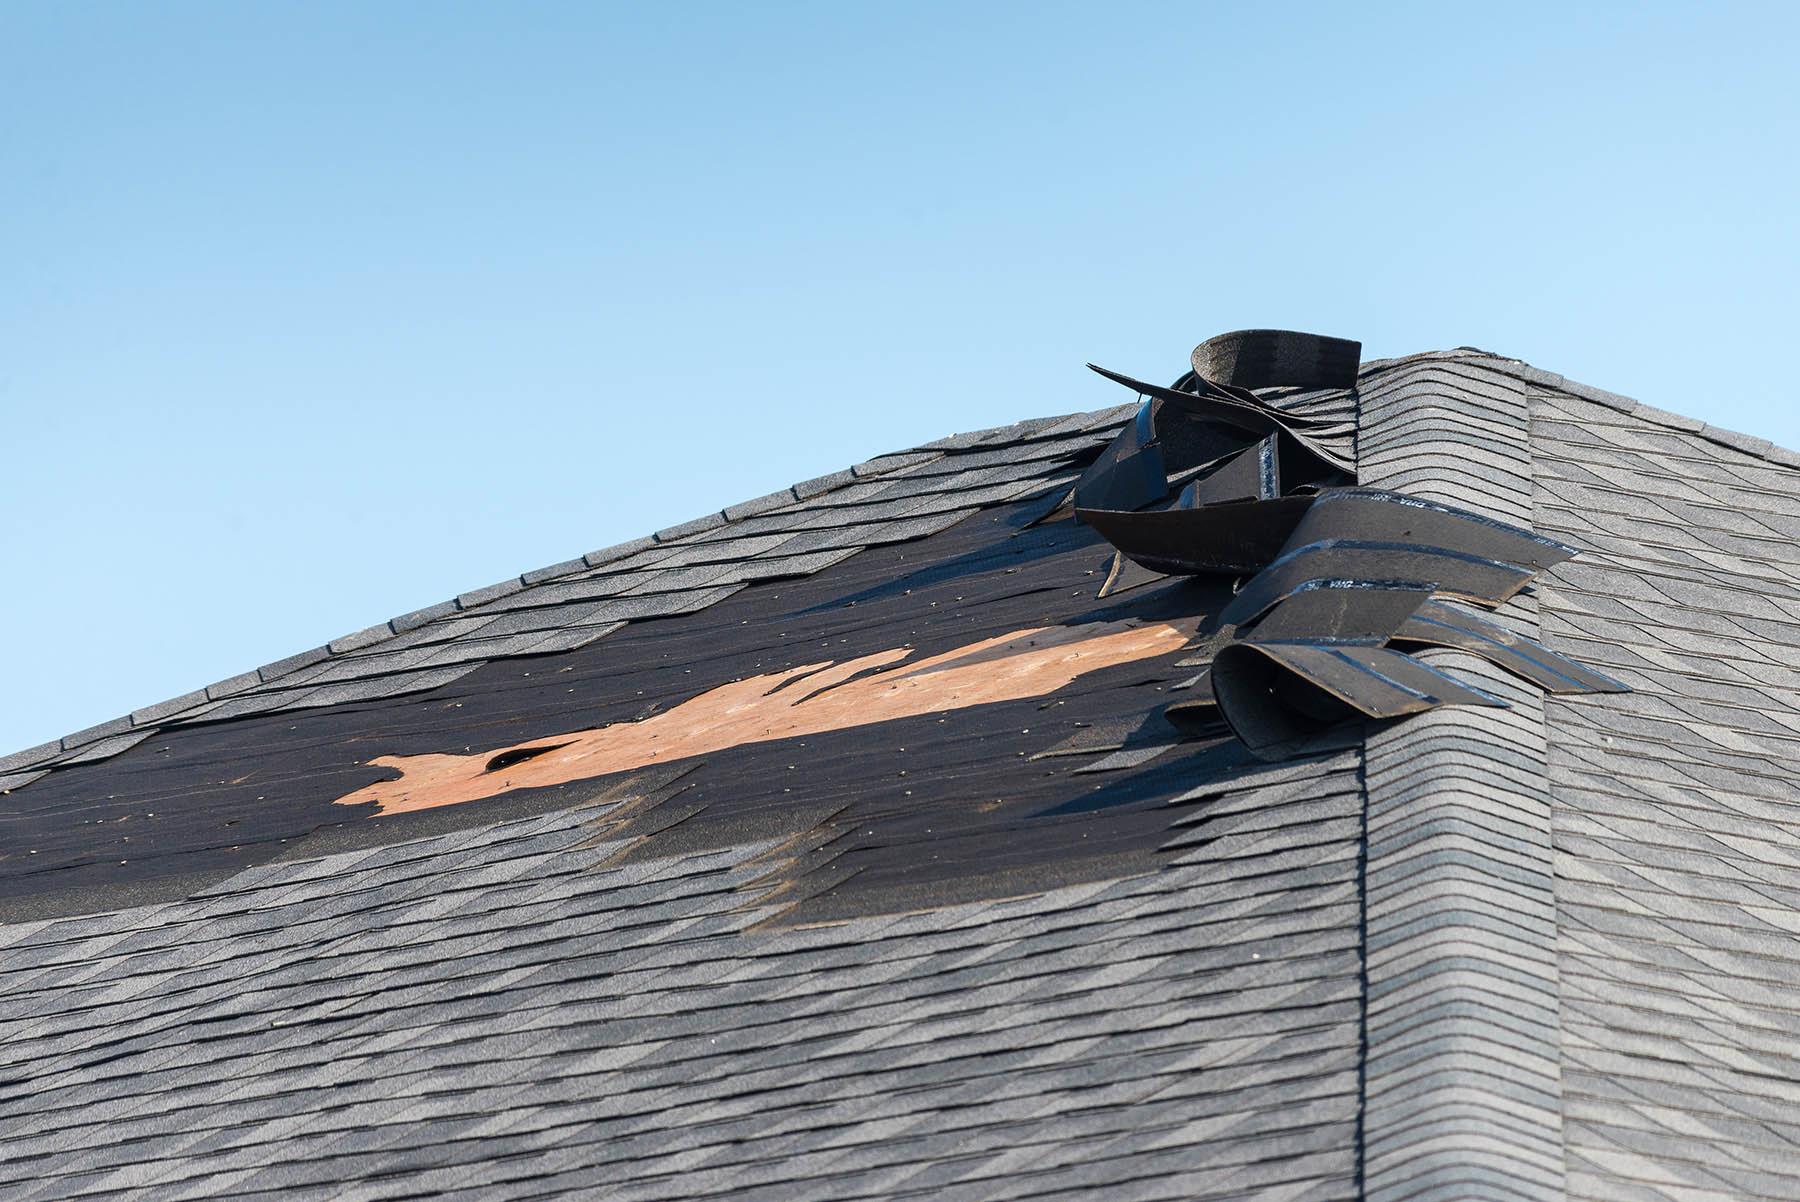 Roofing Repair Connecticut - Nu-Face Home Improvements Connecticut